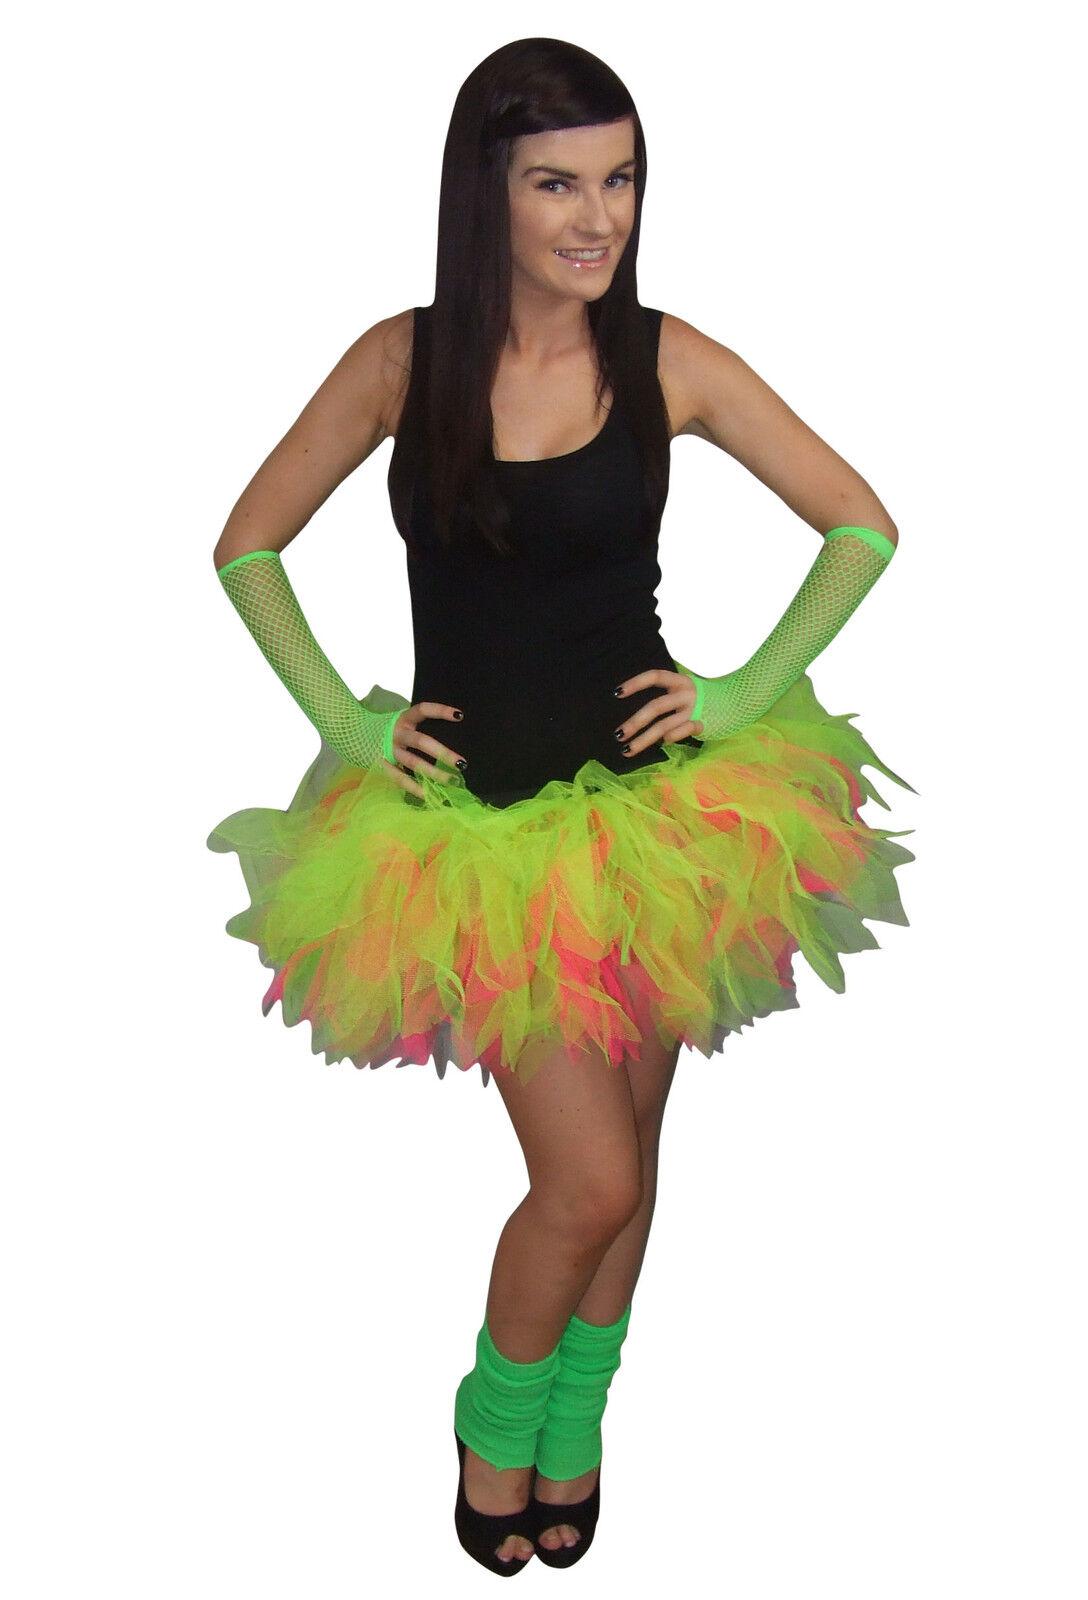 New Ladies Girls St Patrick's day Green Tutu Skirt Fancy Dress Layered Skirts